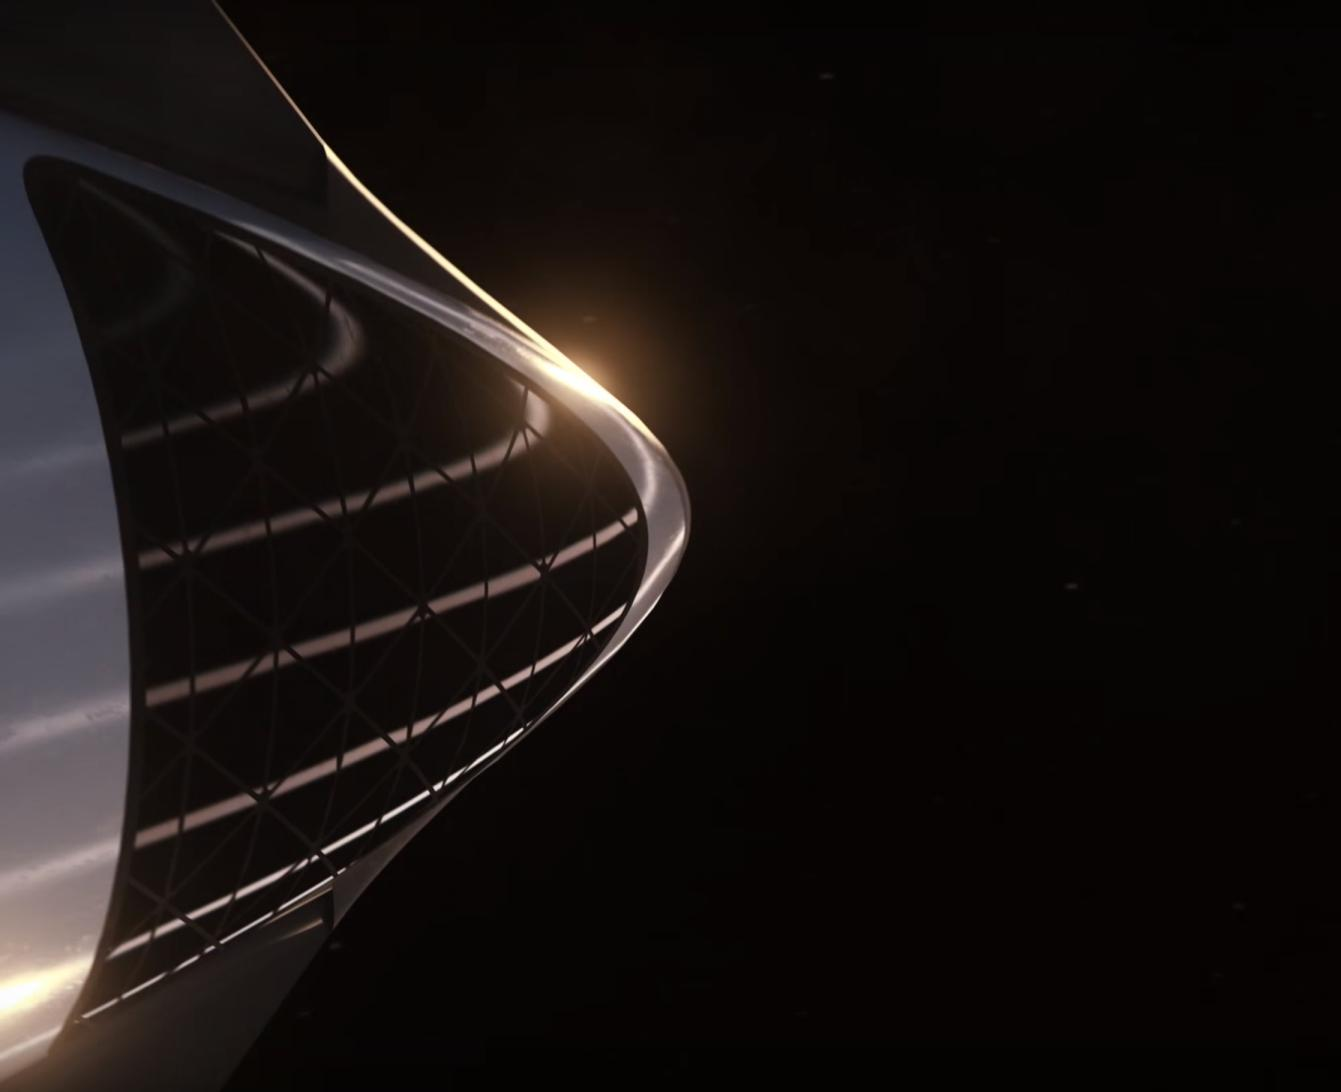 BFR 2018 spaceship nose (SpaceX) 1(c)